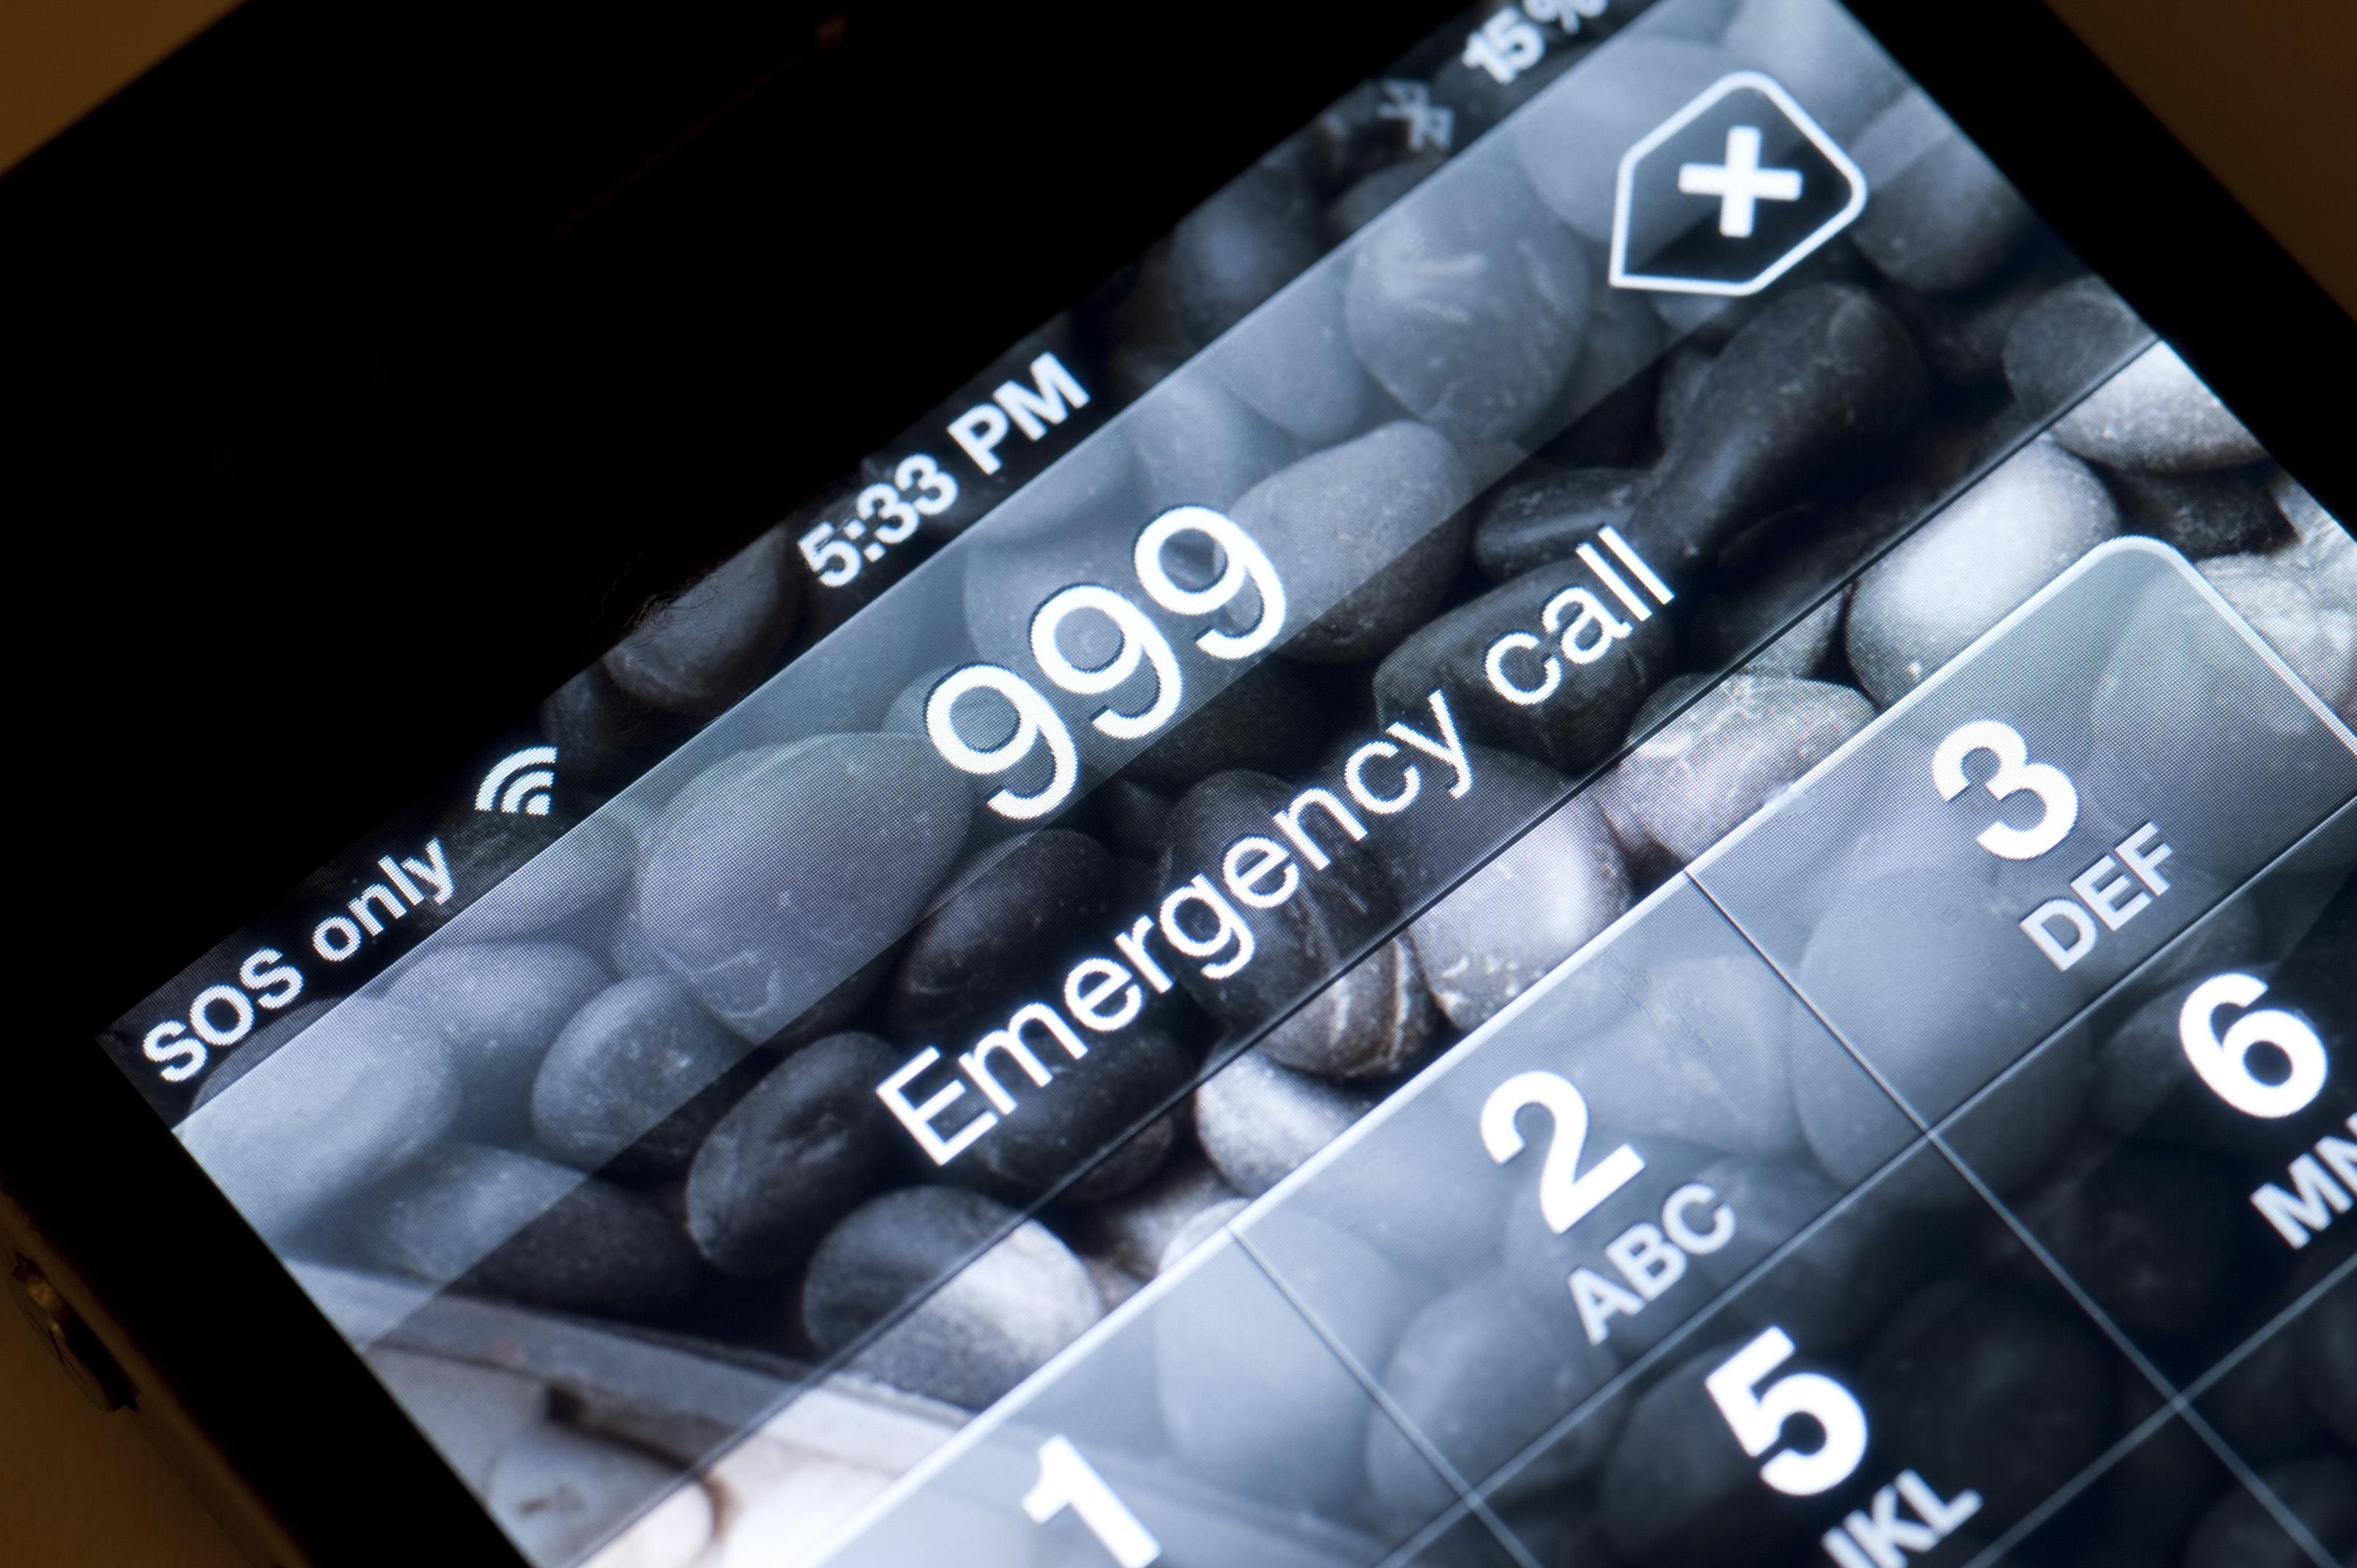 Free Stock Photo Emergency Phone Call